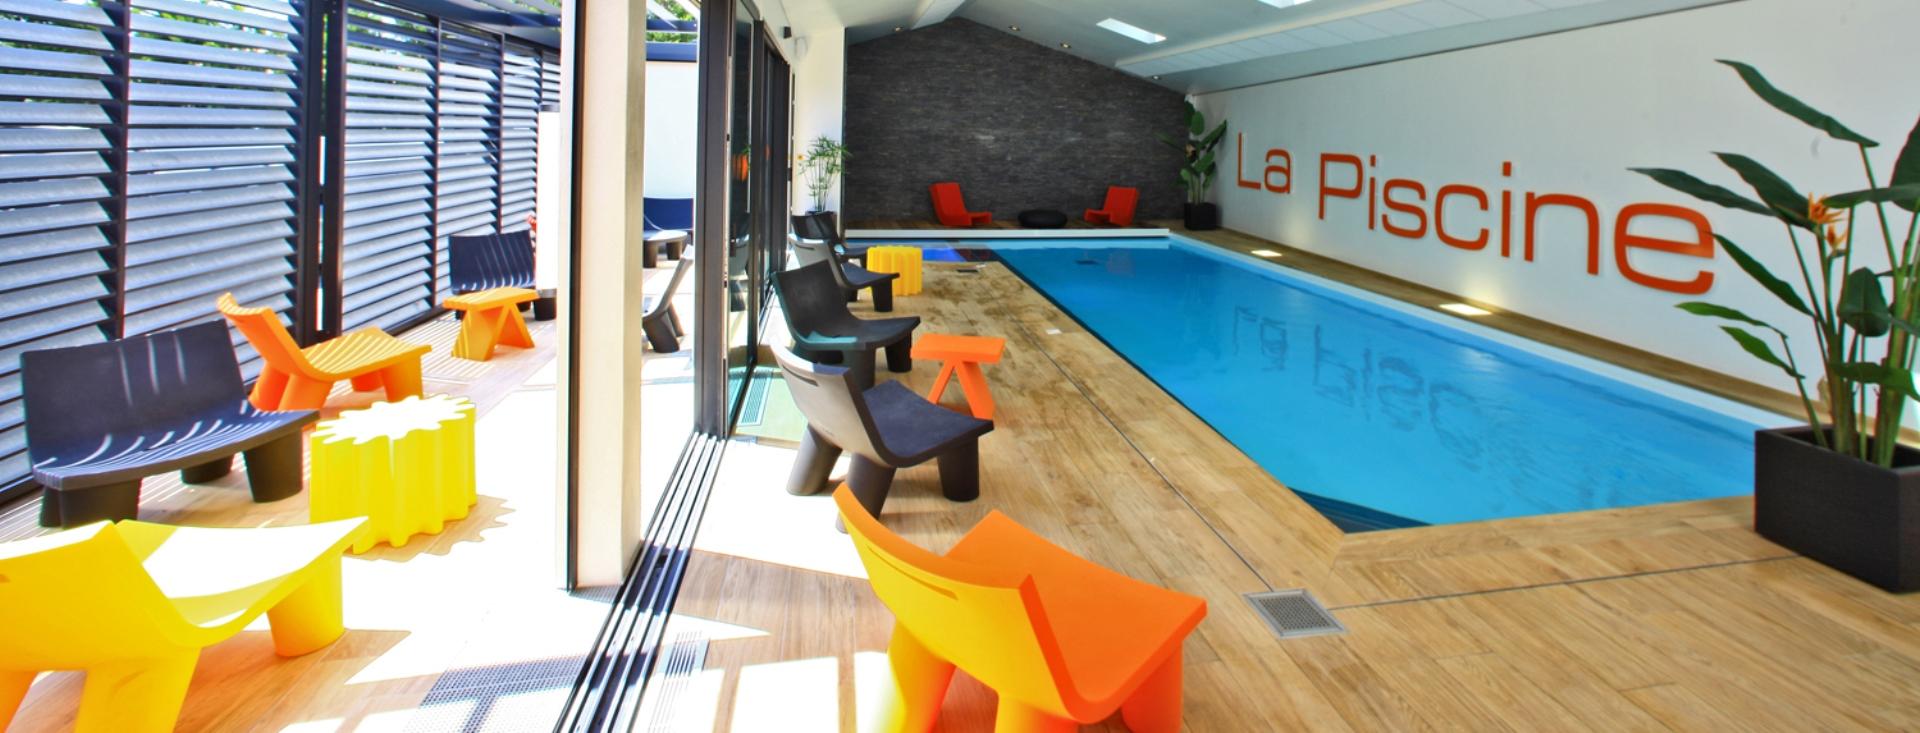 hotel avec piscine intérieure Vendée